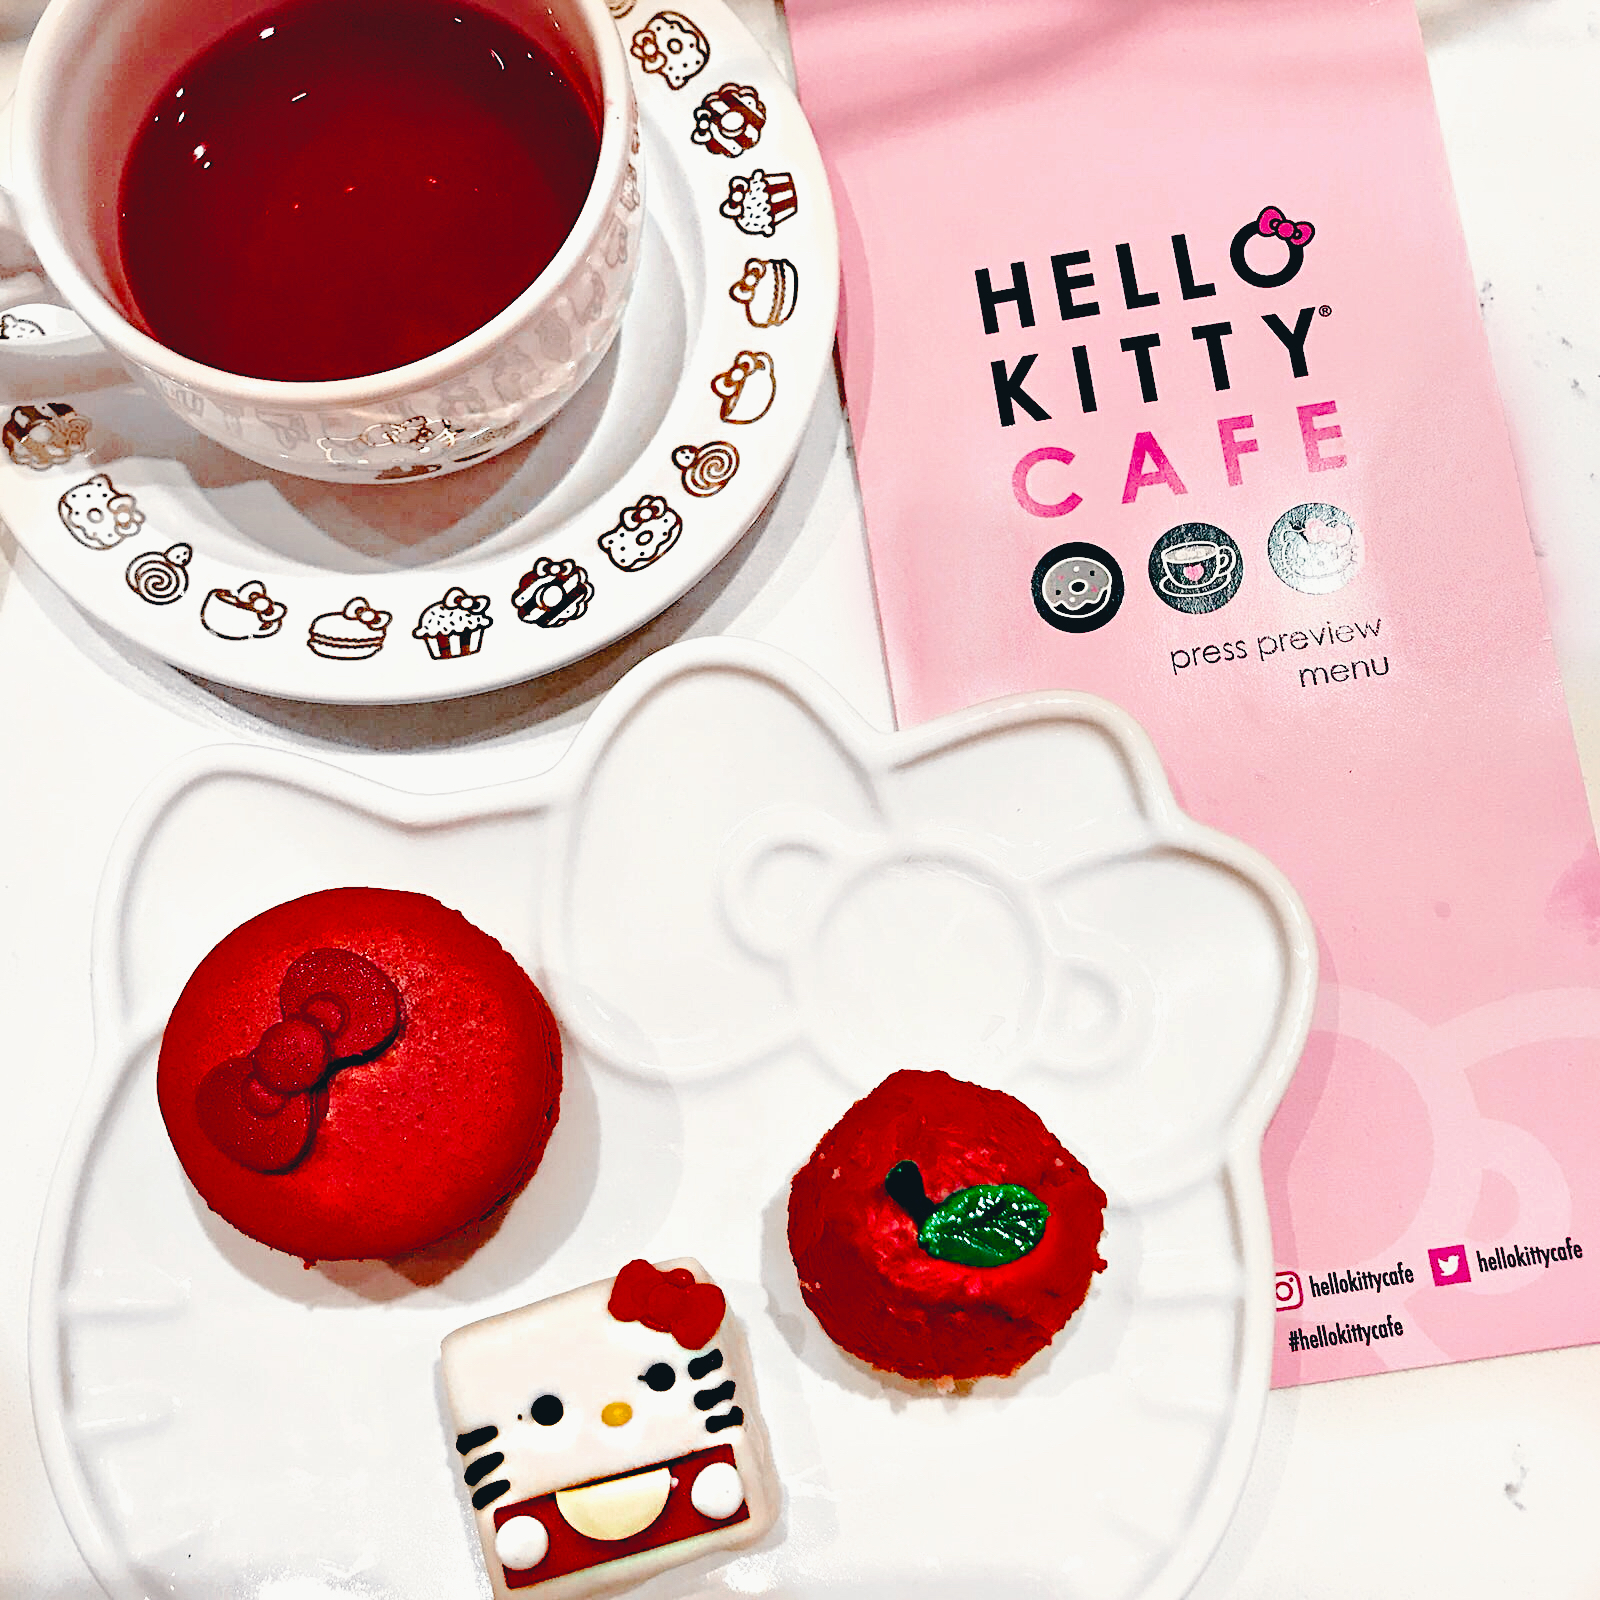 hello-kitty-cafe-4.jpg